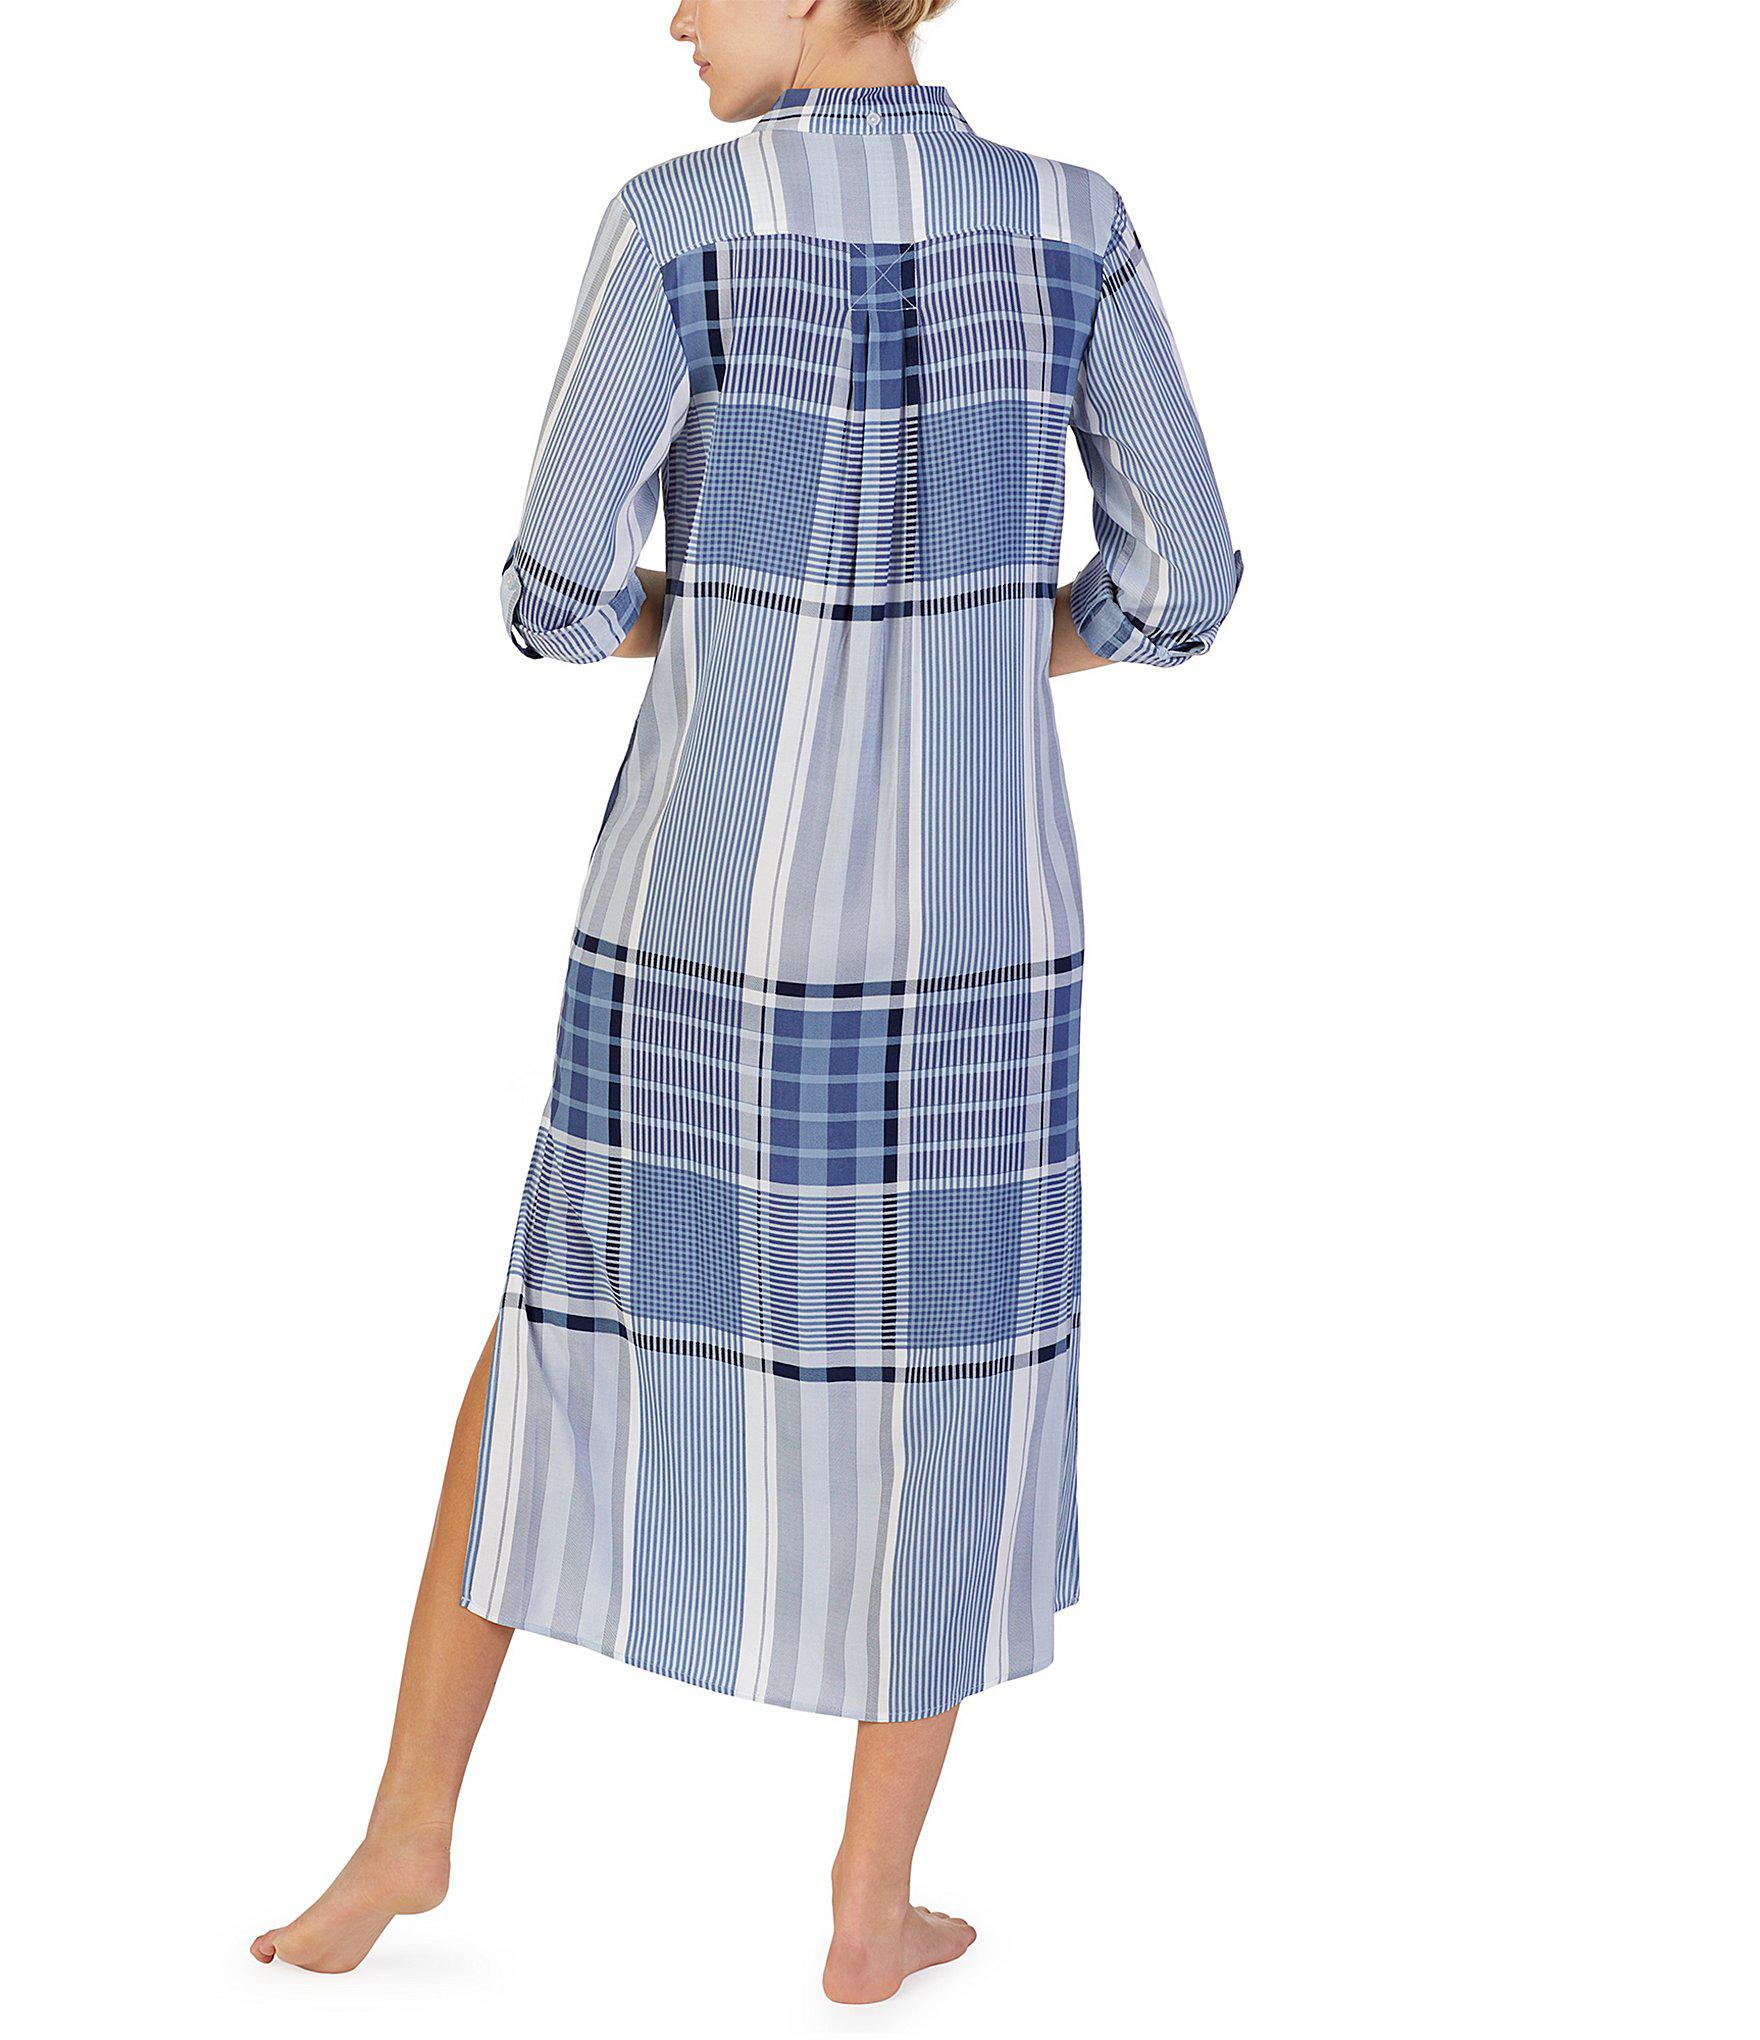 c4bfa77bfc4307 Donna Karan - Blue Mixed Print Maxi Sleep Shirt - Lyst. View fullscreen